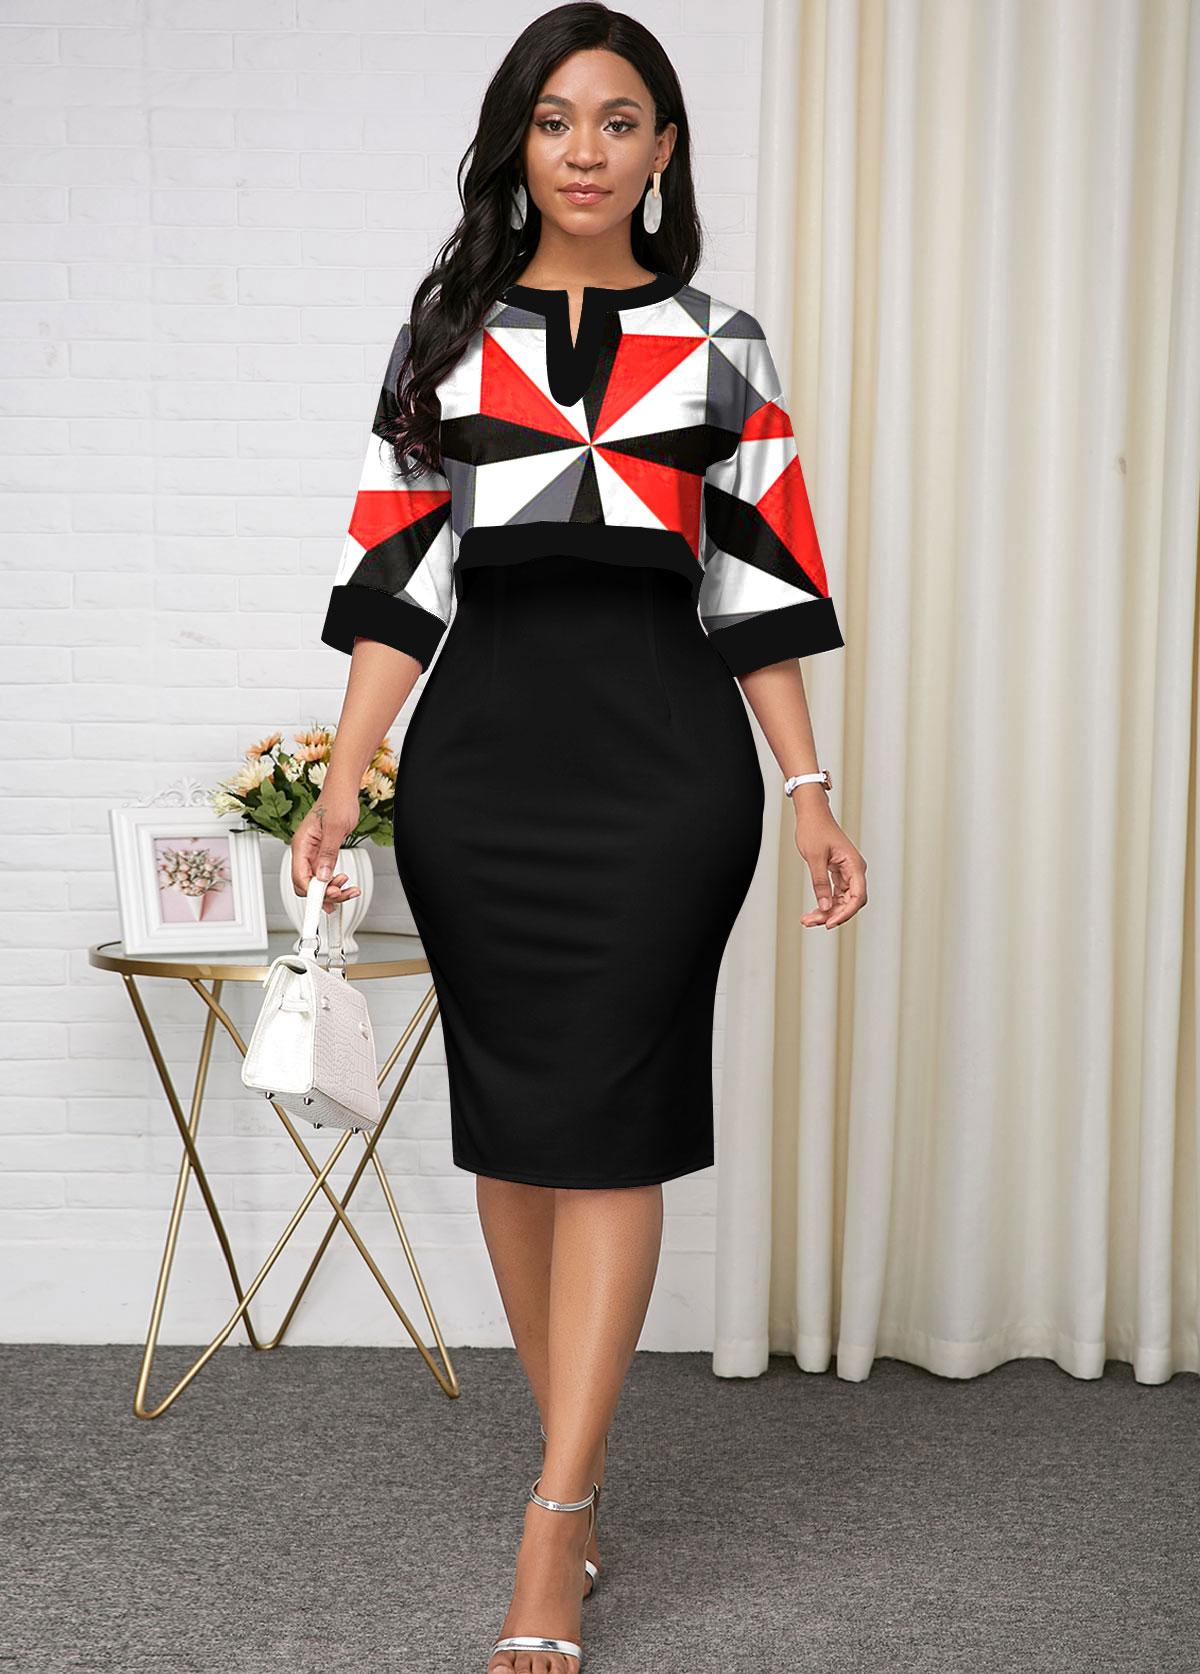 ROTITA Geometric Print Top and Black Bodycon Dress